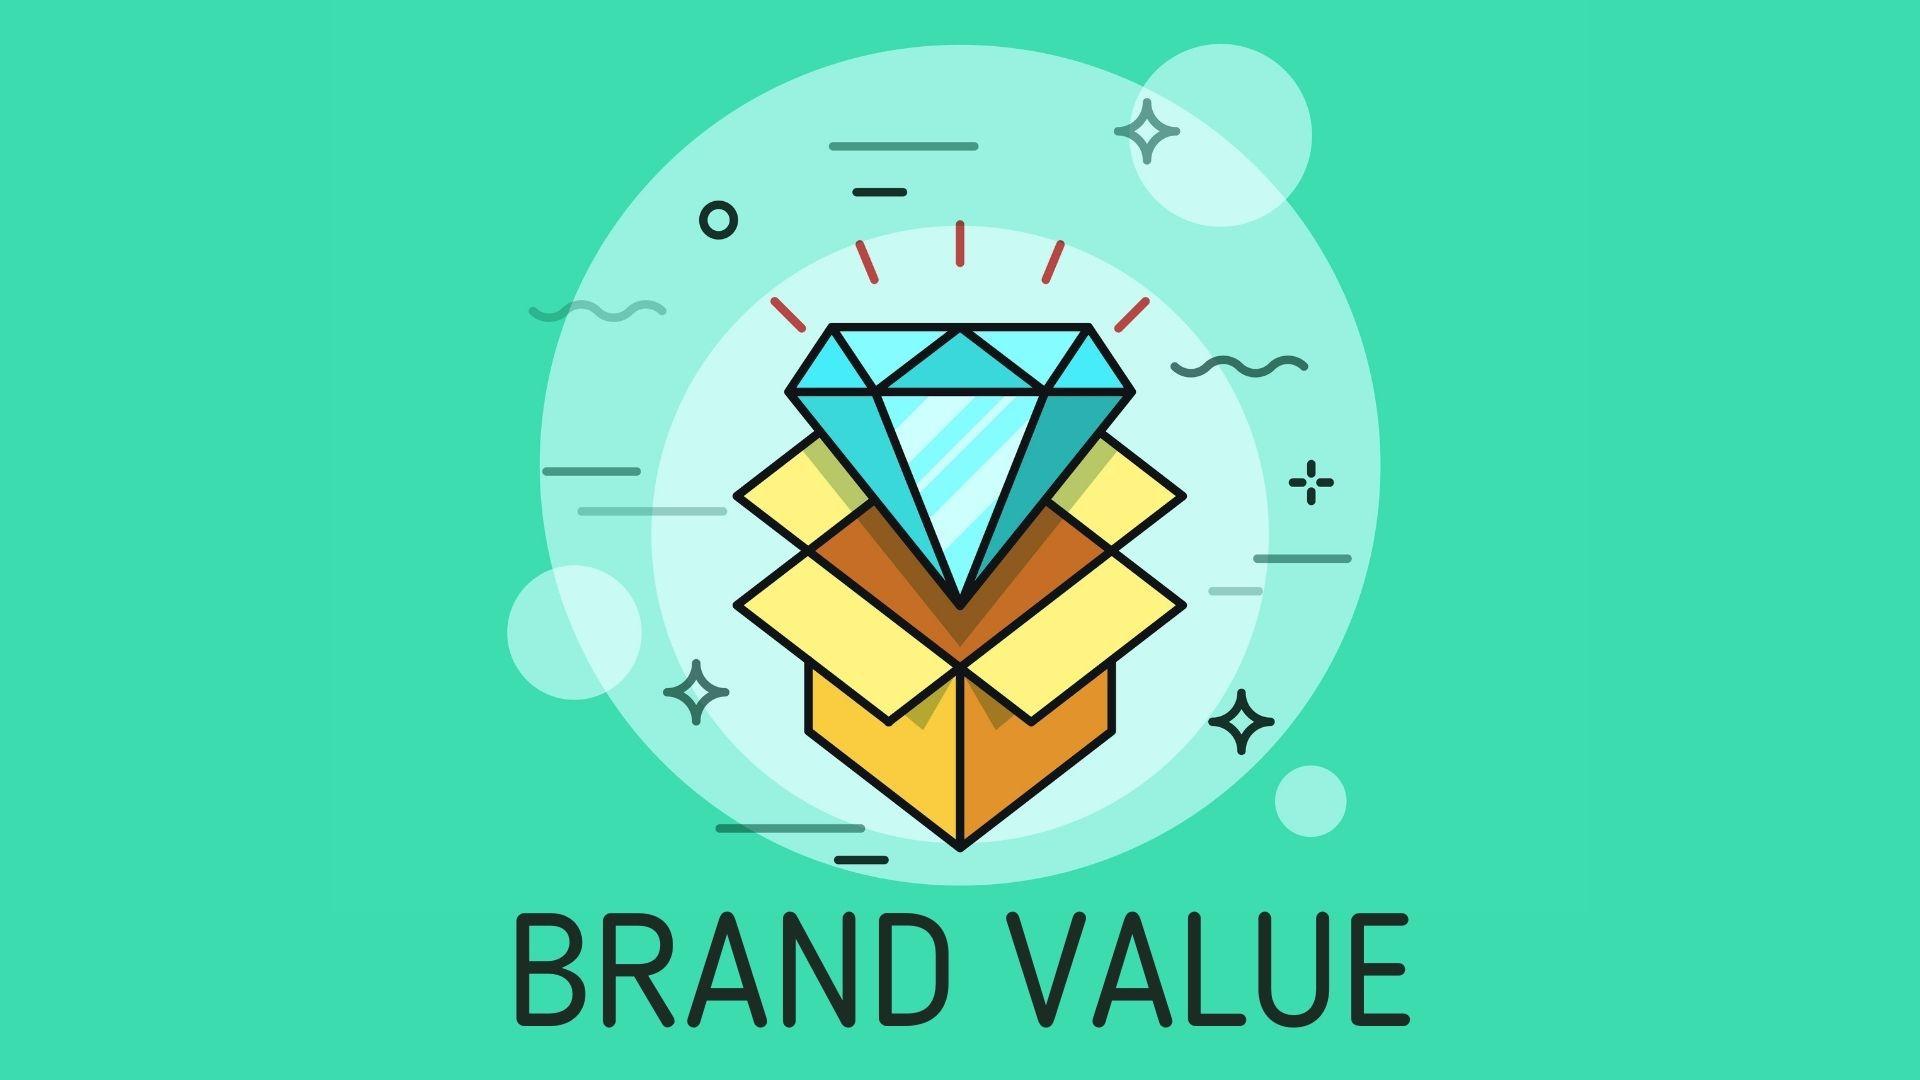 brand's value